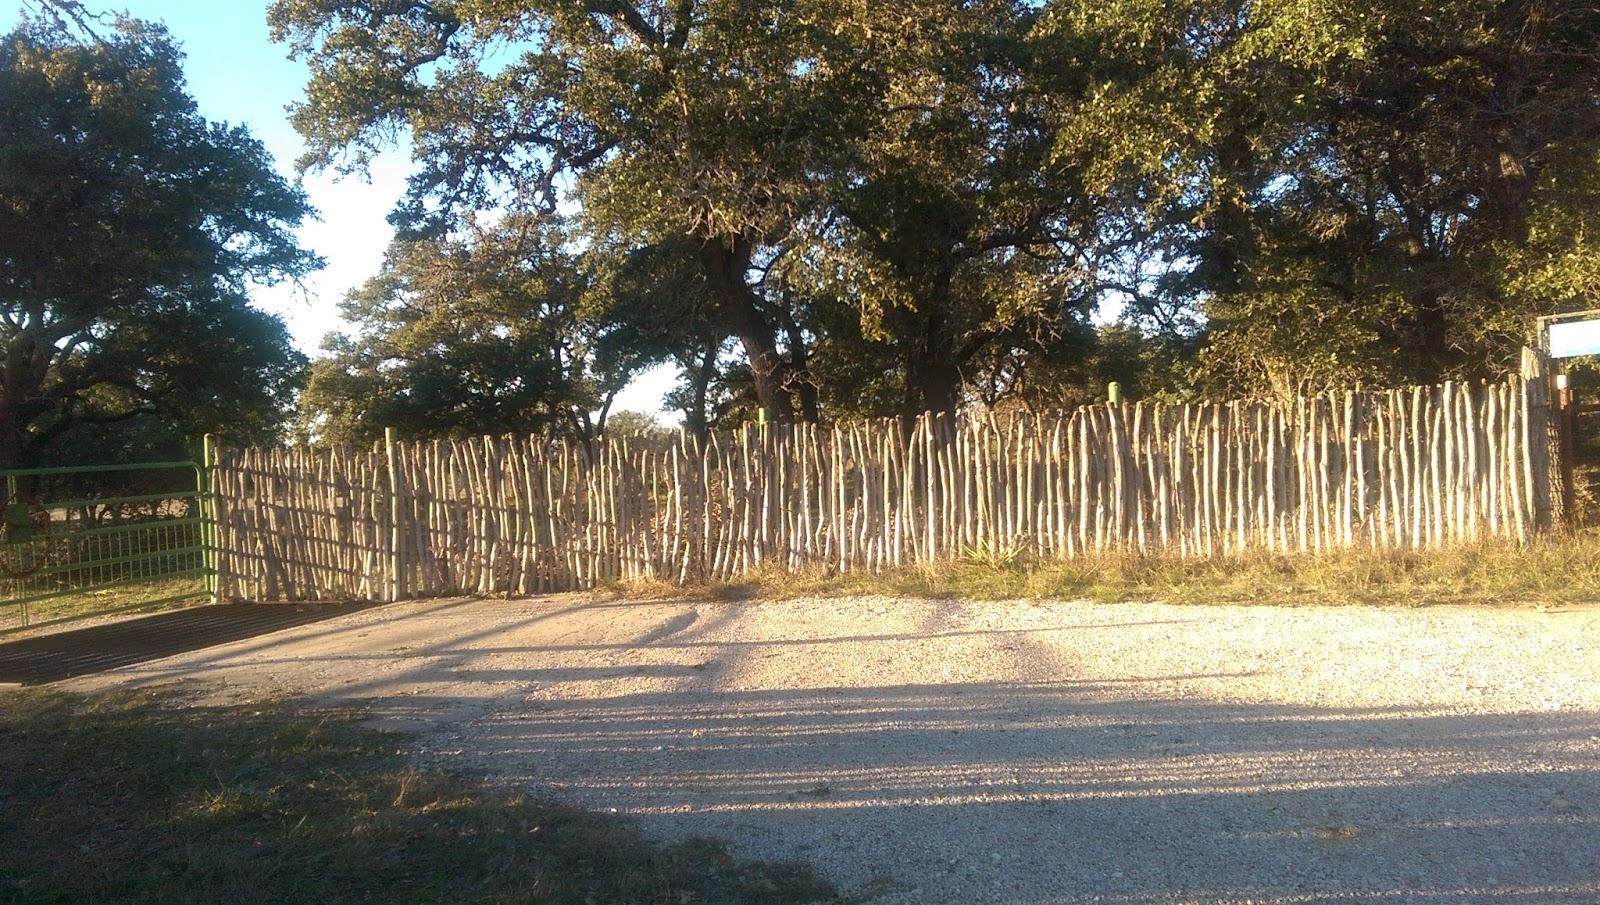 Gardening at Draco: Cactus Fence